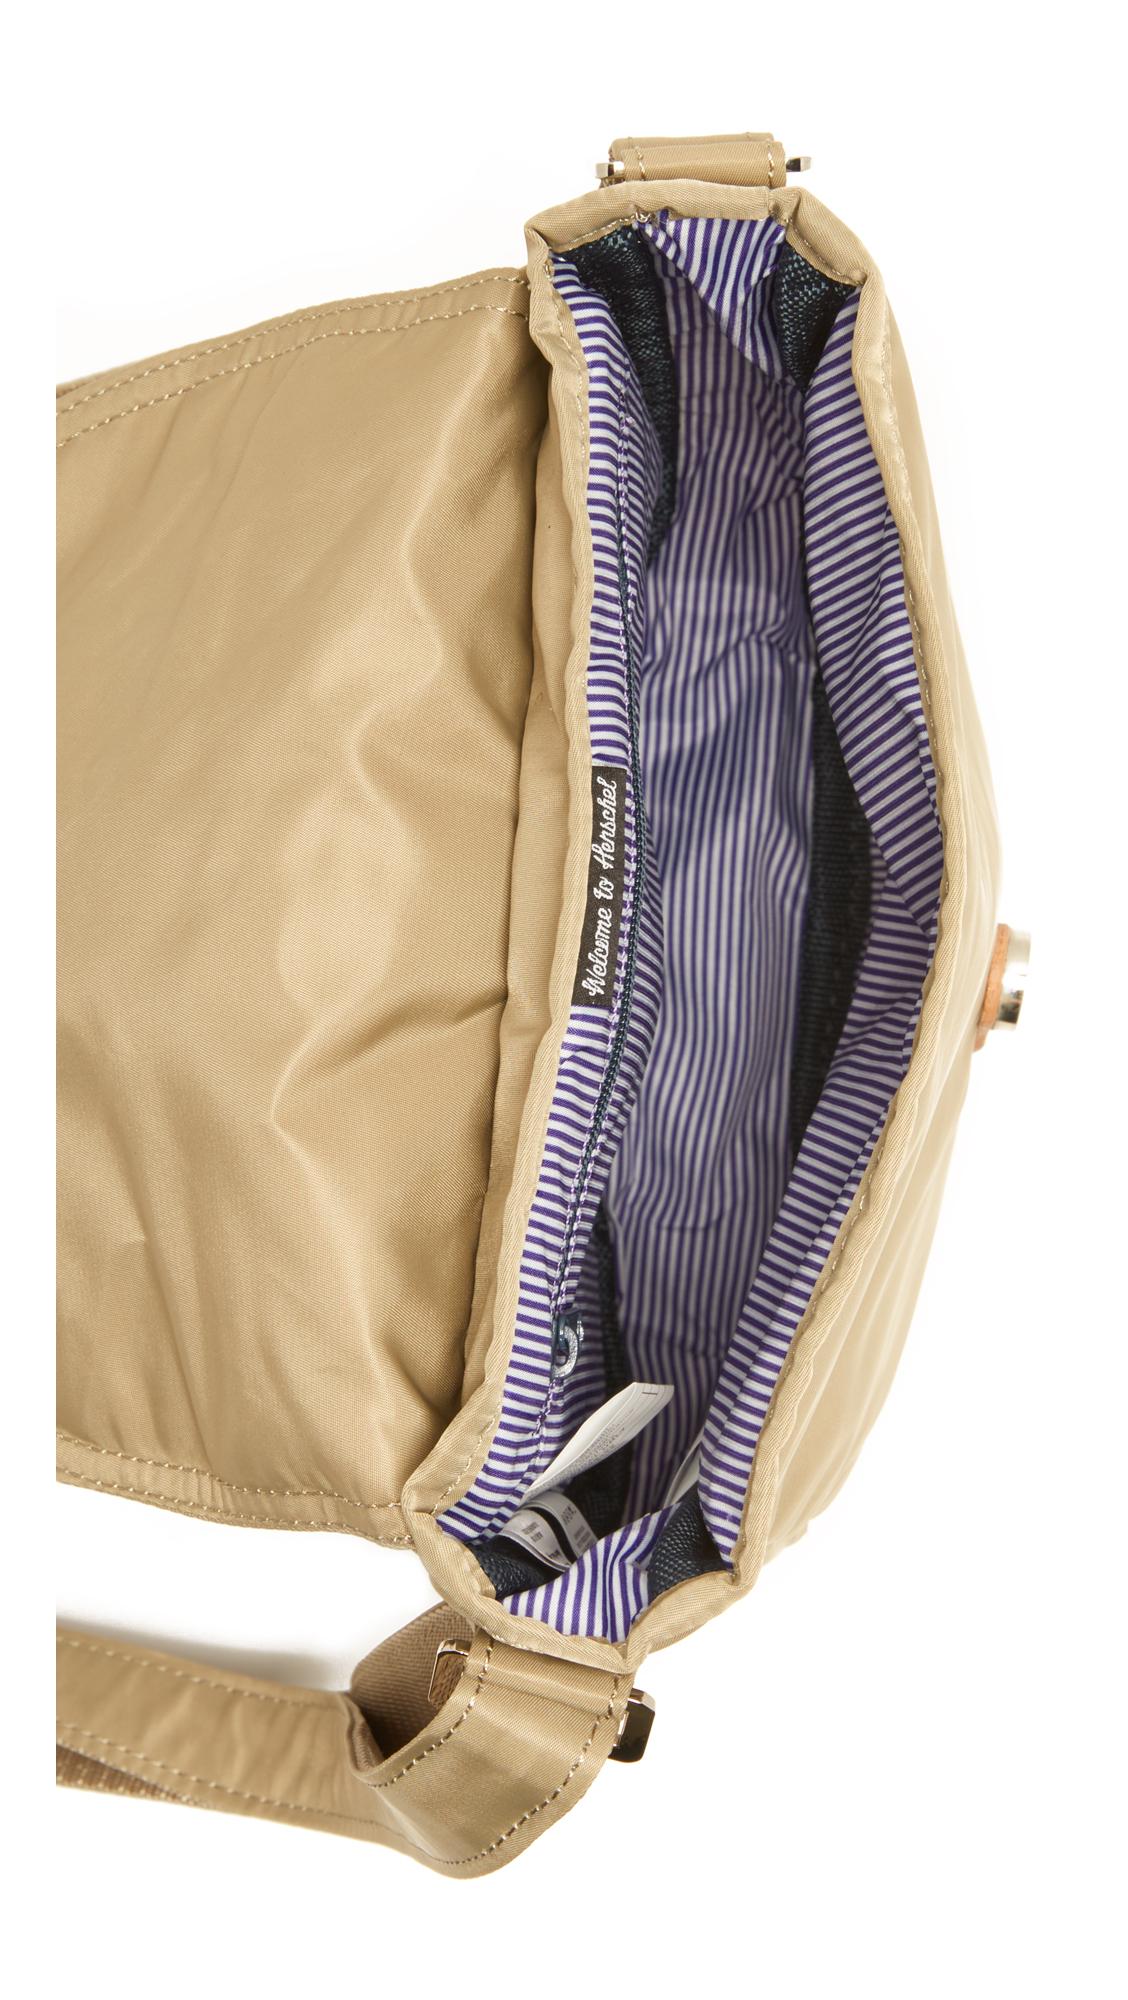 da84f9f65185 Herschel Supply Co. Kingsgate Cross Body Bag